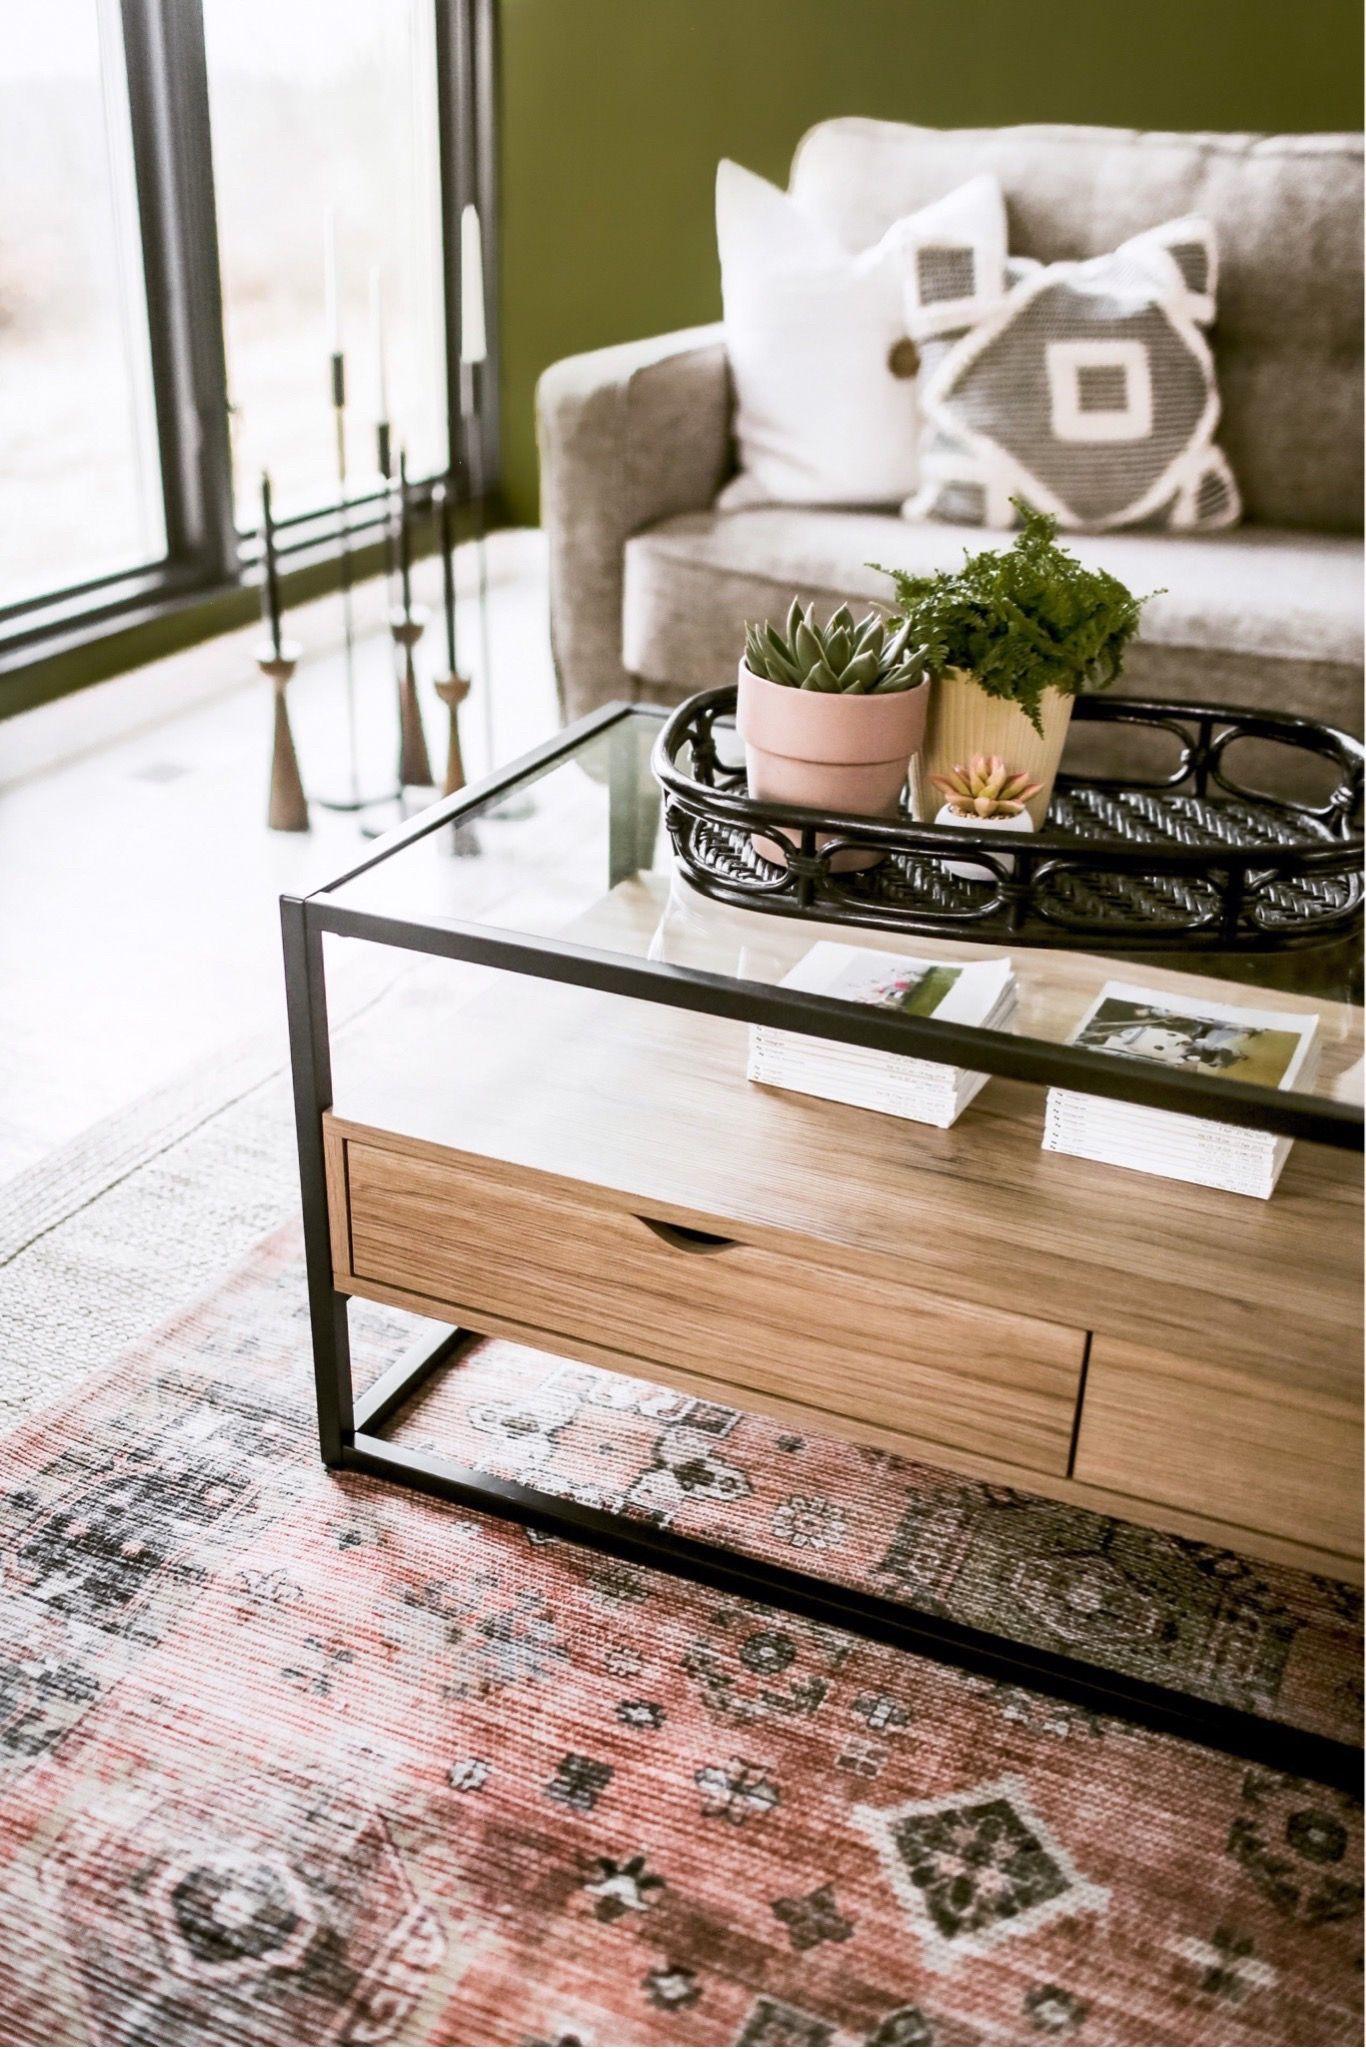 Boho Scandinavian Style Living Room Layered Rugs Living Room World Market Rug Guest Bedroom Decor [ 2049 x 1366 Pixel ]